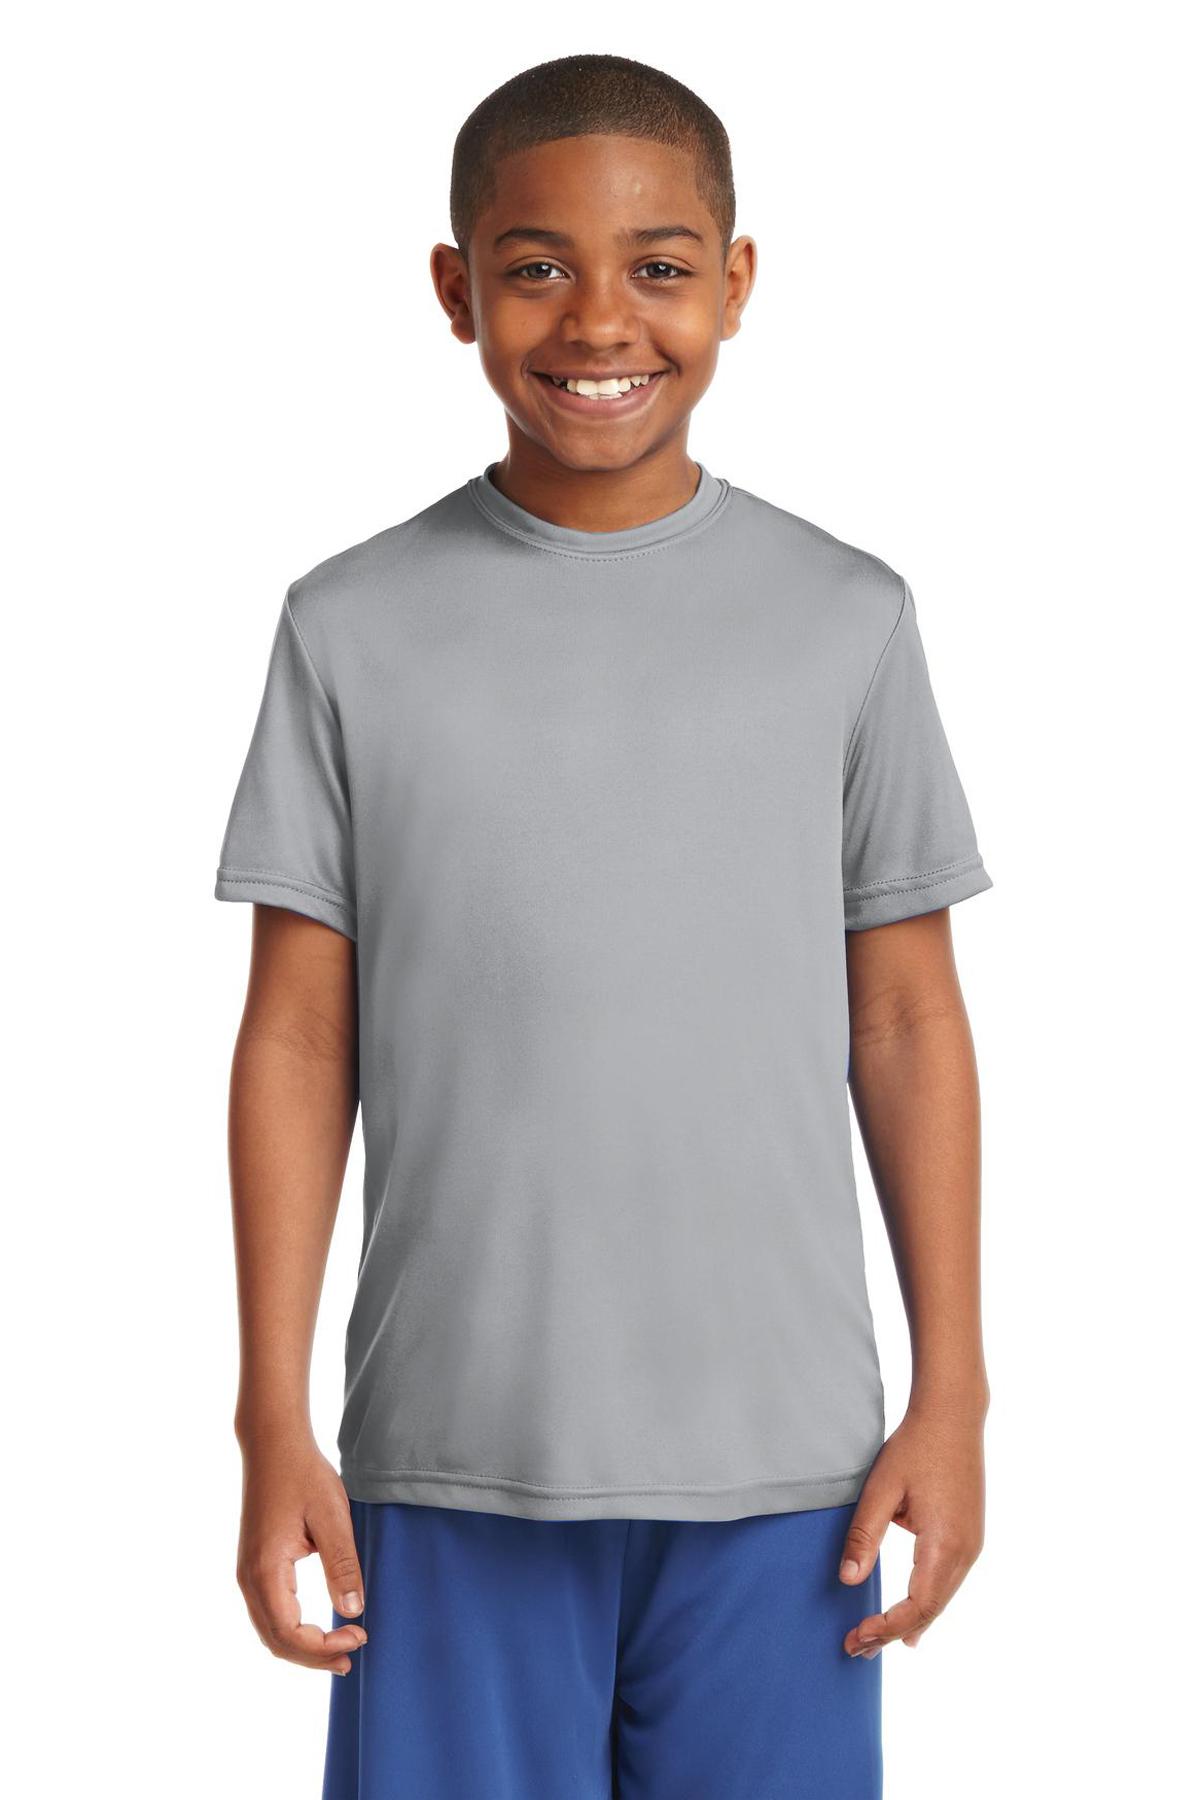 T-Shirts-Performance-45